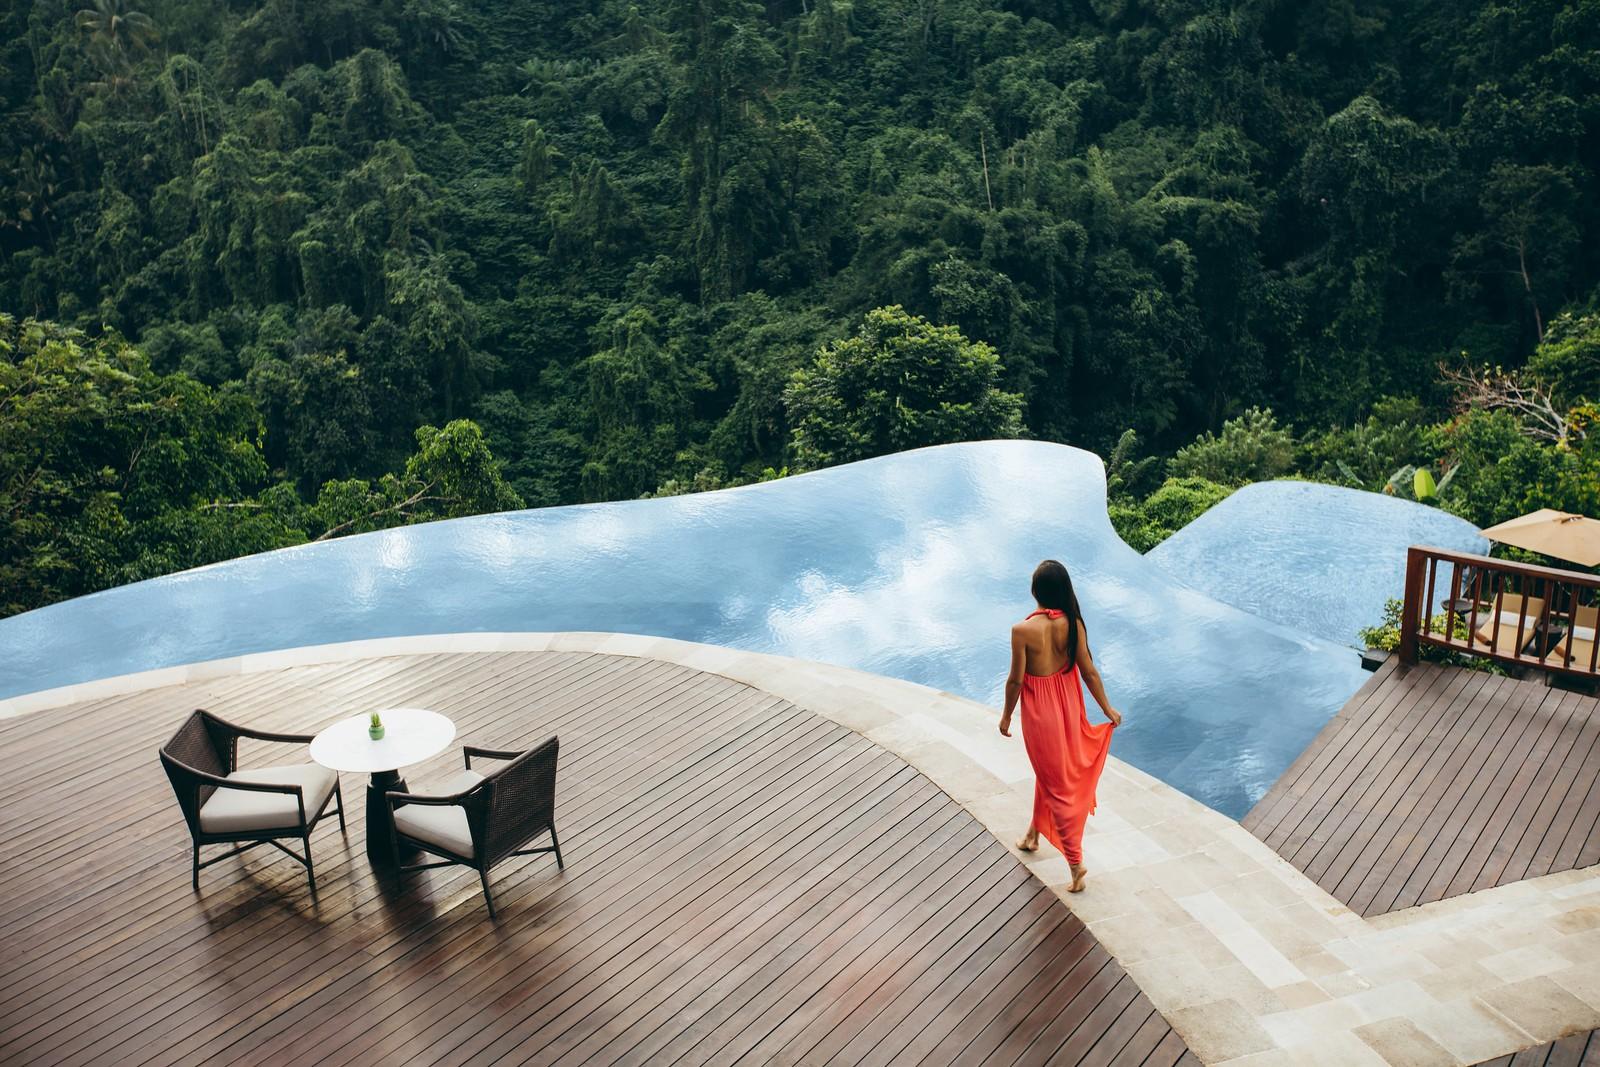 https://www.otdesign.com/wp-content/uploads/2020/11/OTdesign_Hanging_Gardens_Bali-jgrtskn-x3.jpg